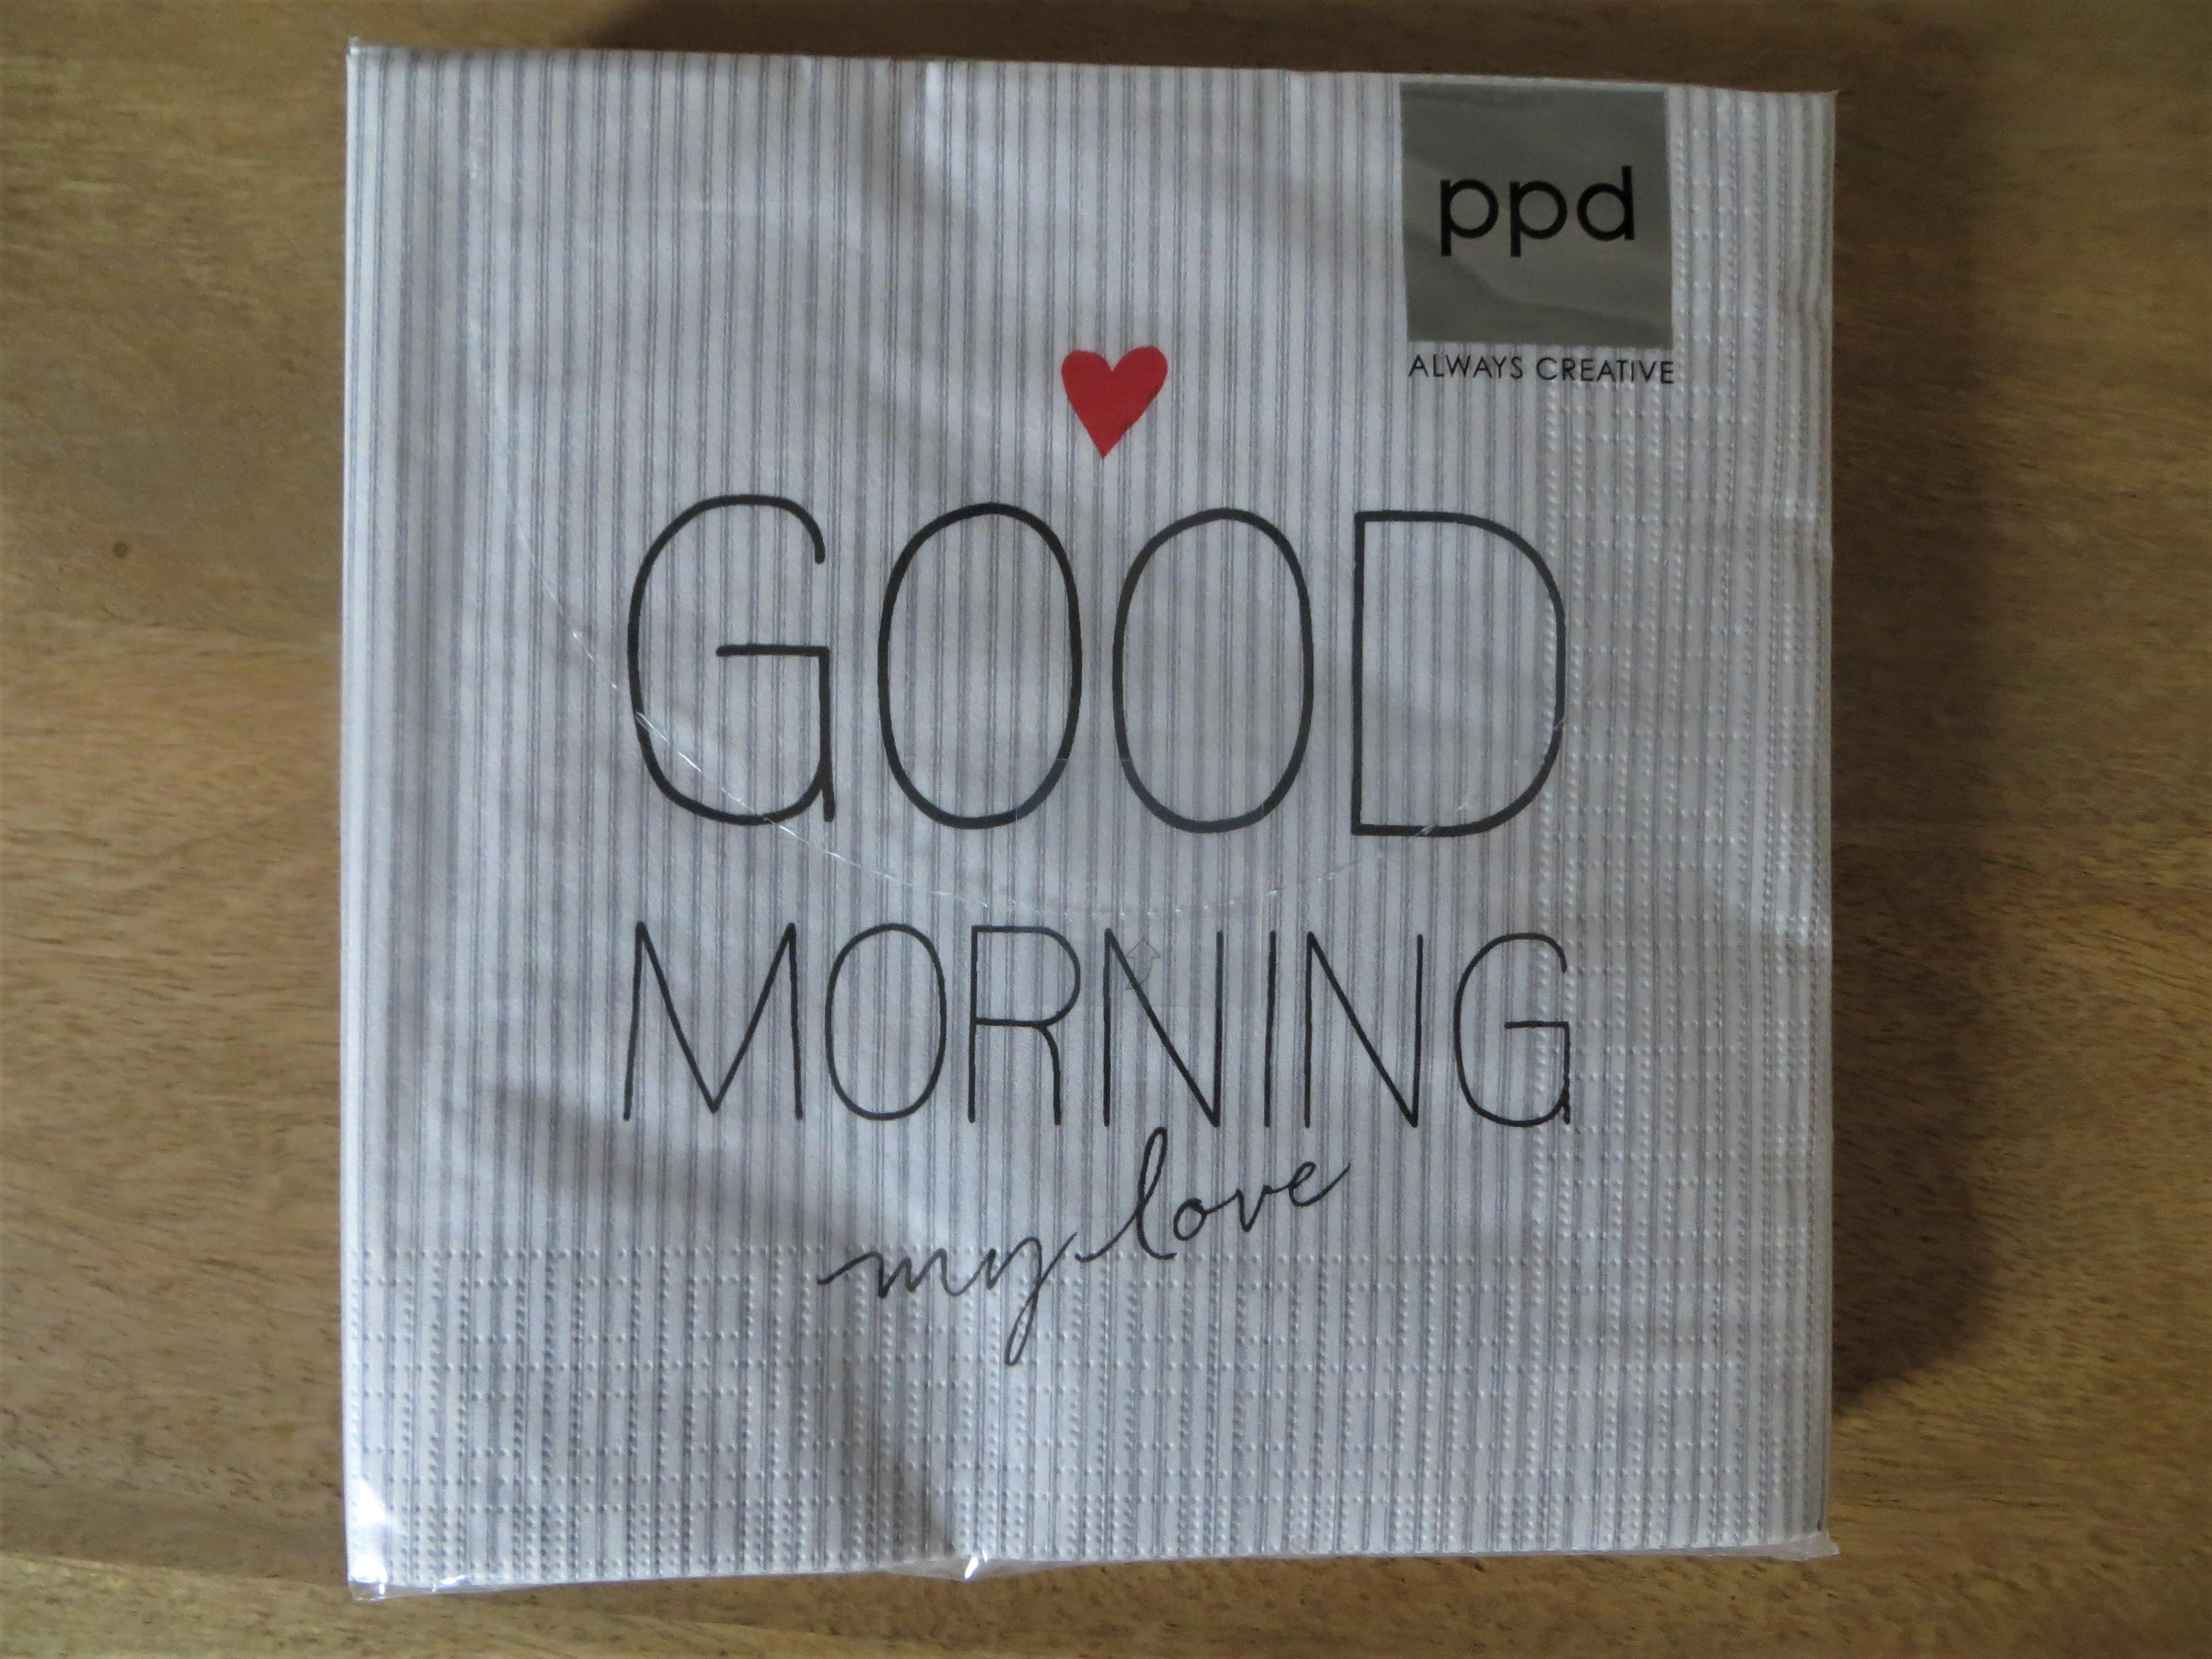 Servietten weiß grau gestreift Good morning my love 16x16 cm